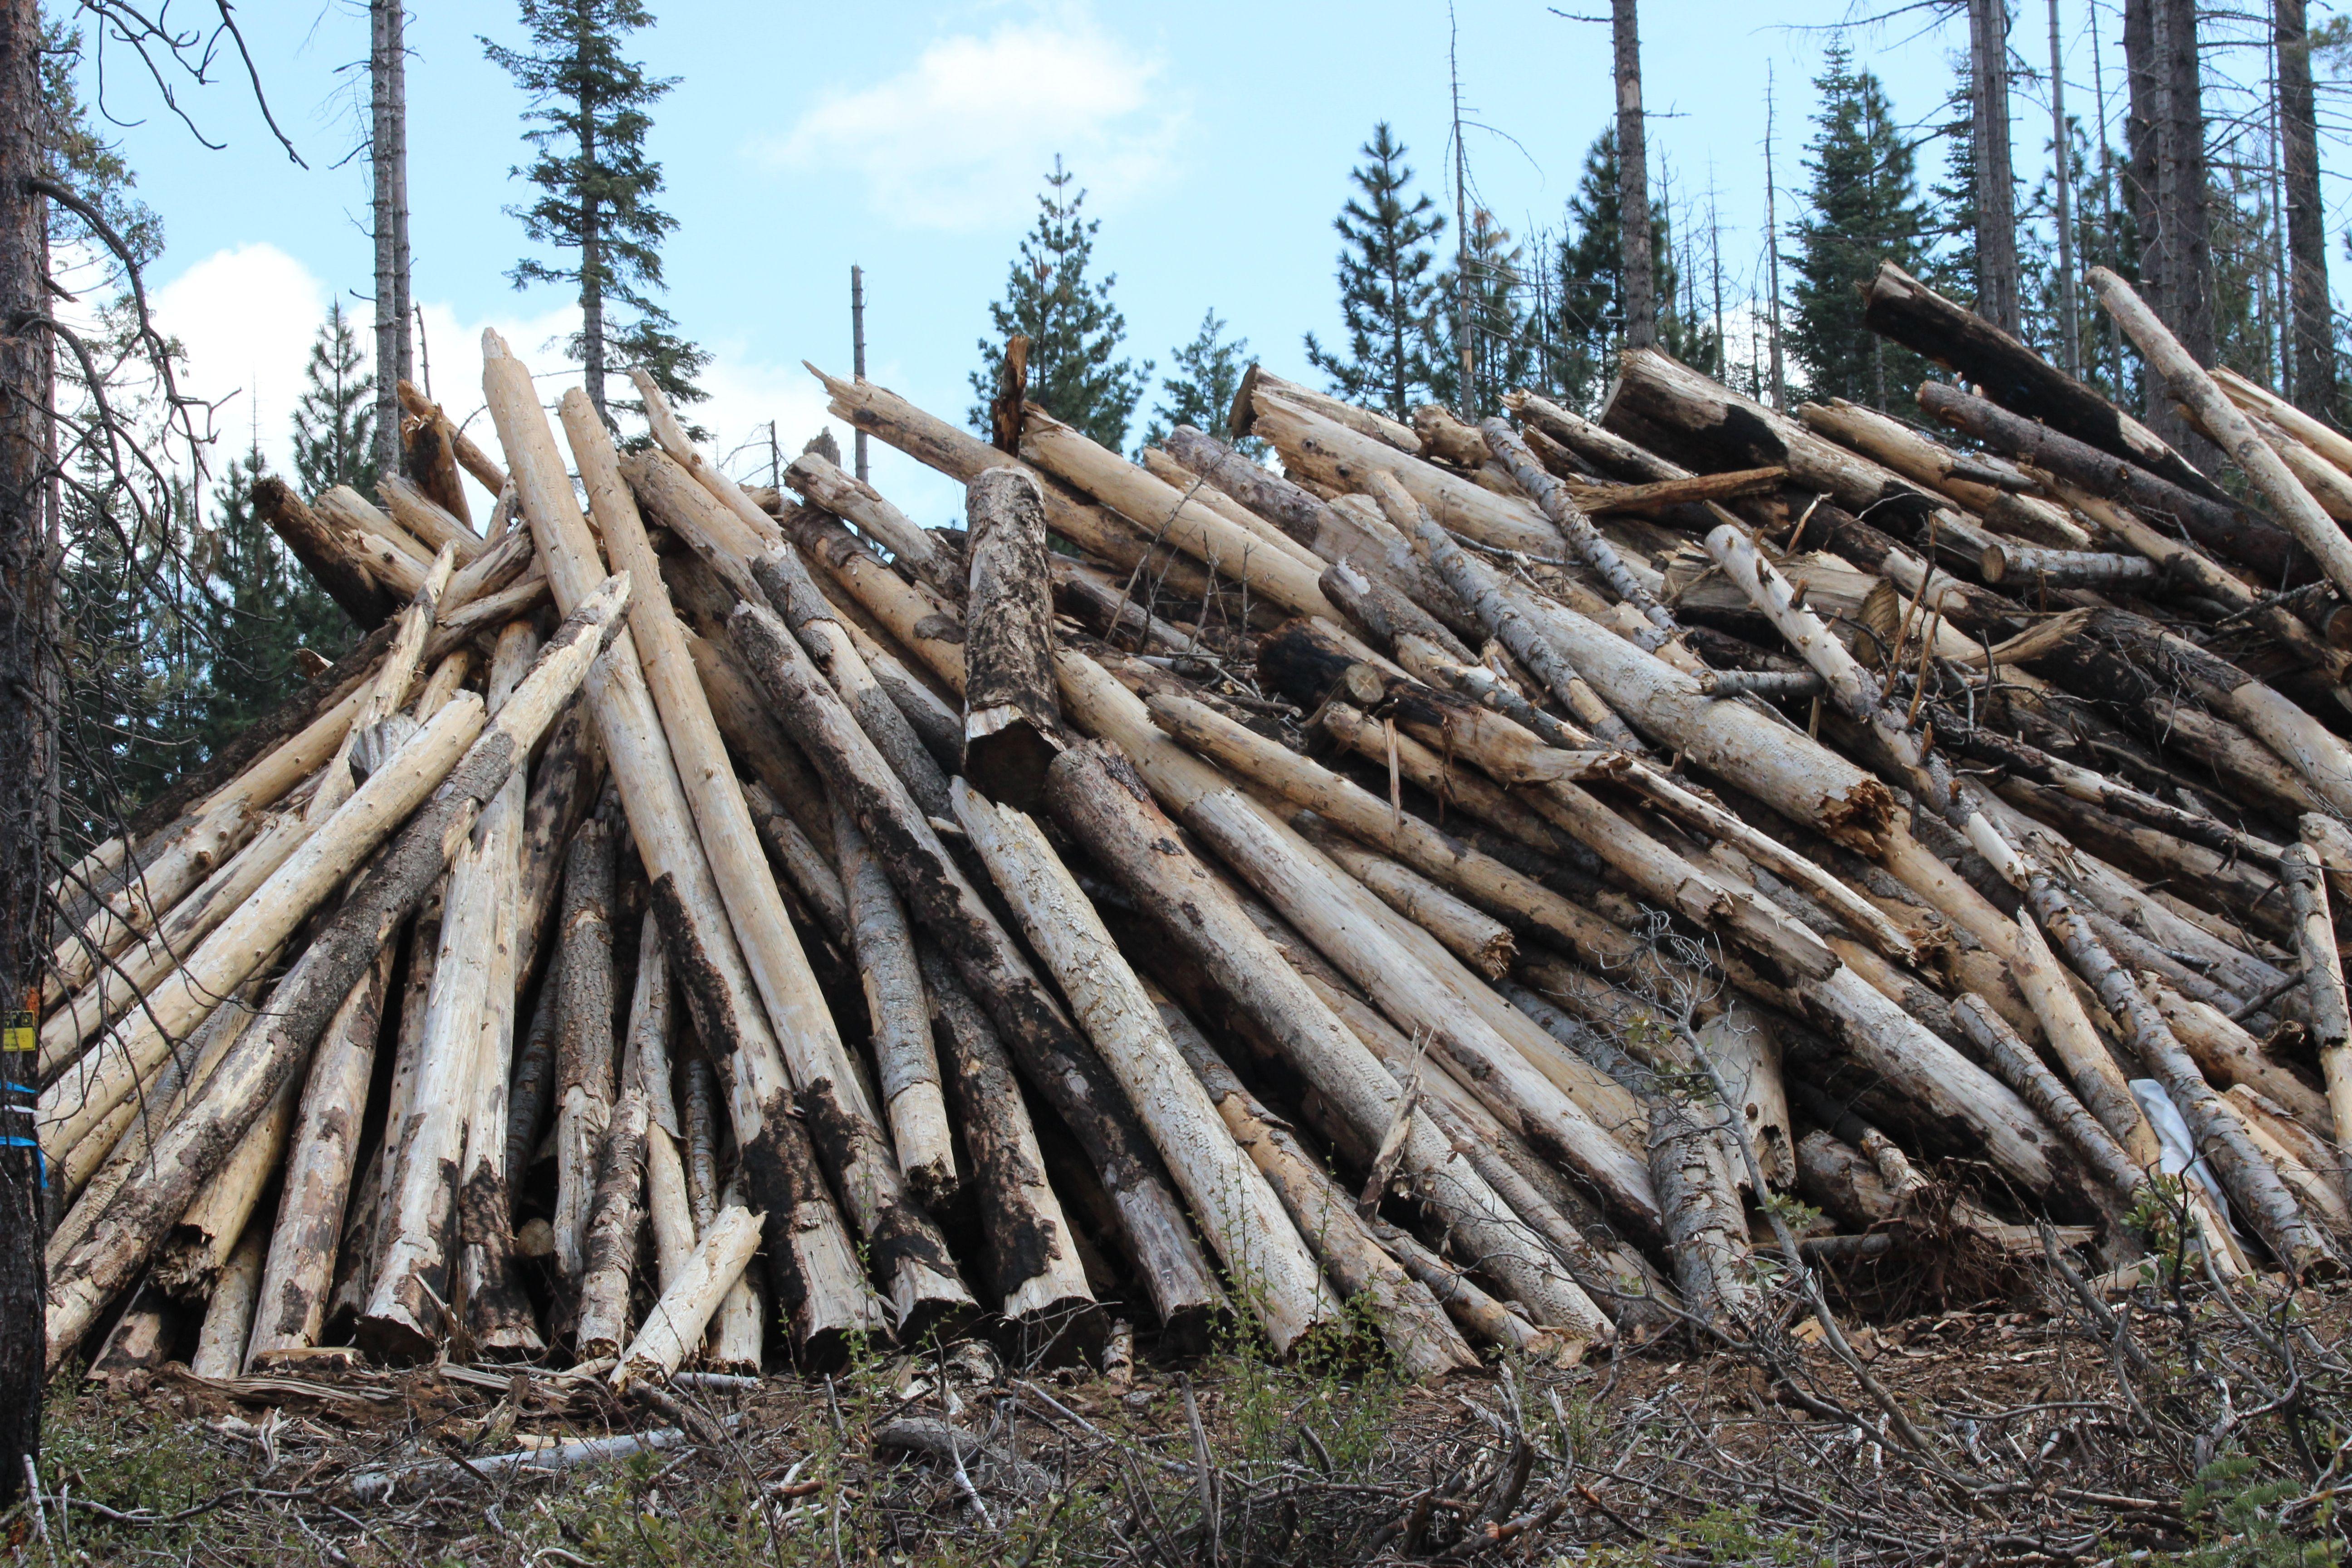 Harvesting the burned trees/logs   Scenic getaways   Pinterest